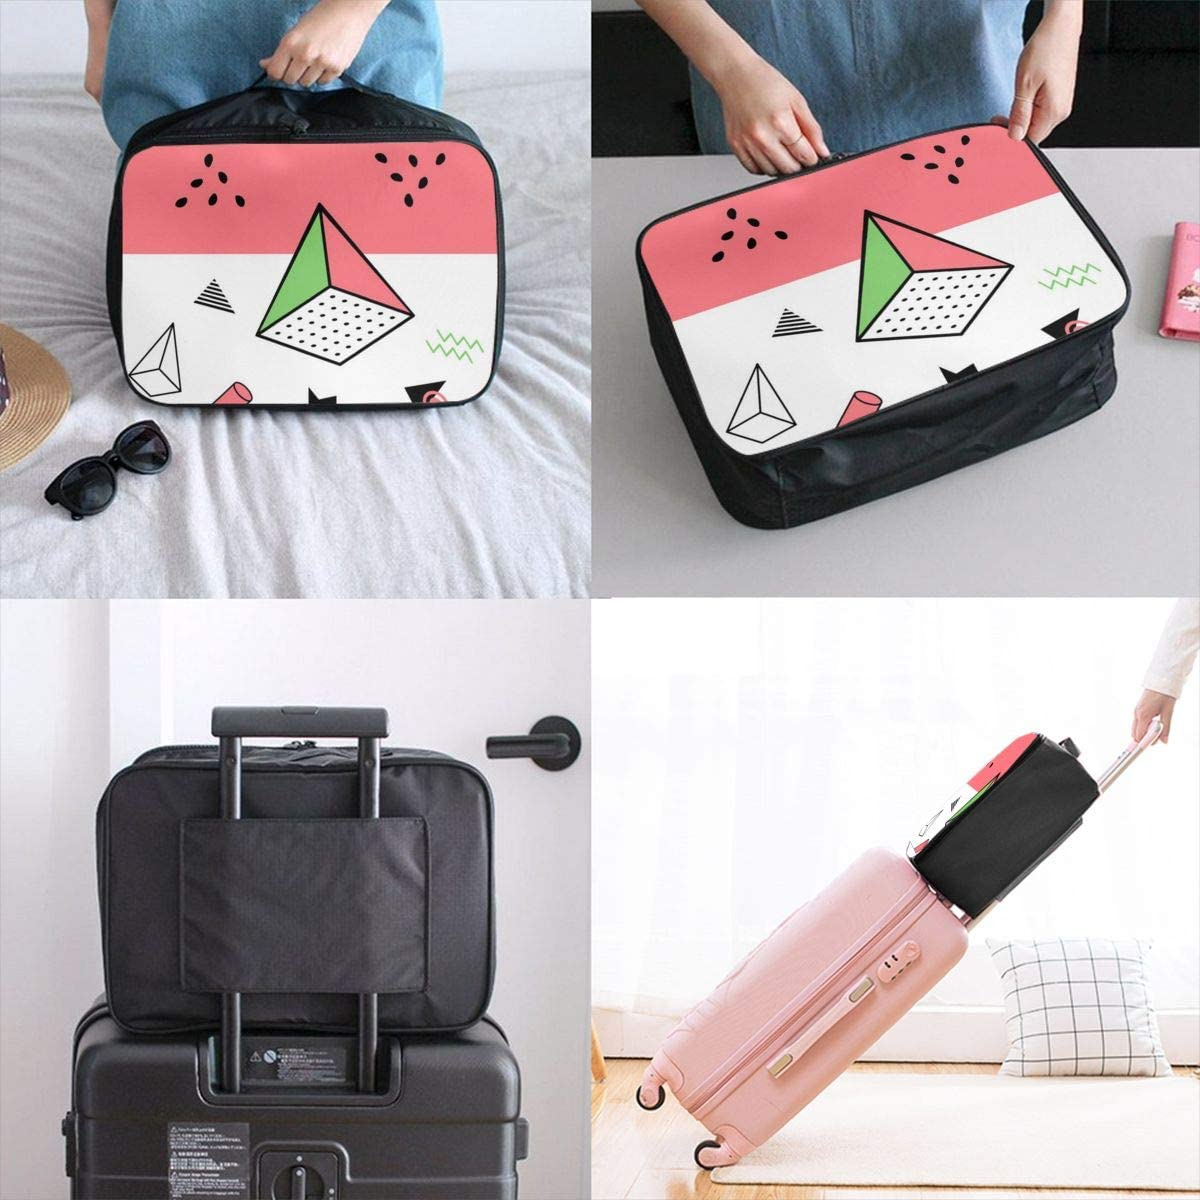 Yunshm Geometric Elements Customized Trolley Handbag Waterproof Unisex Large Capacity For Business Travel Storage